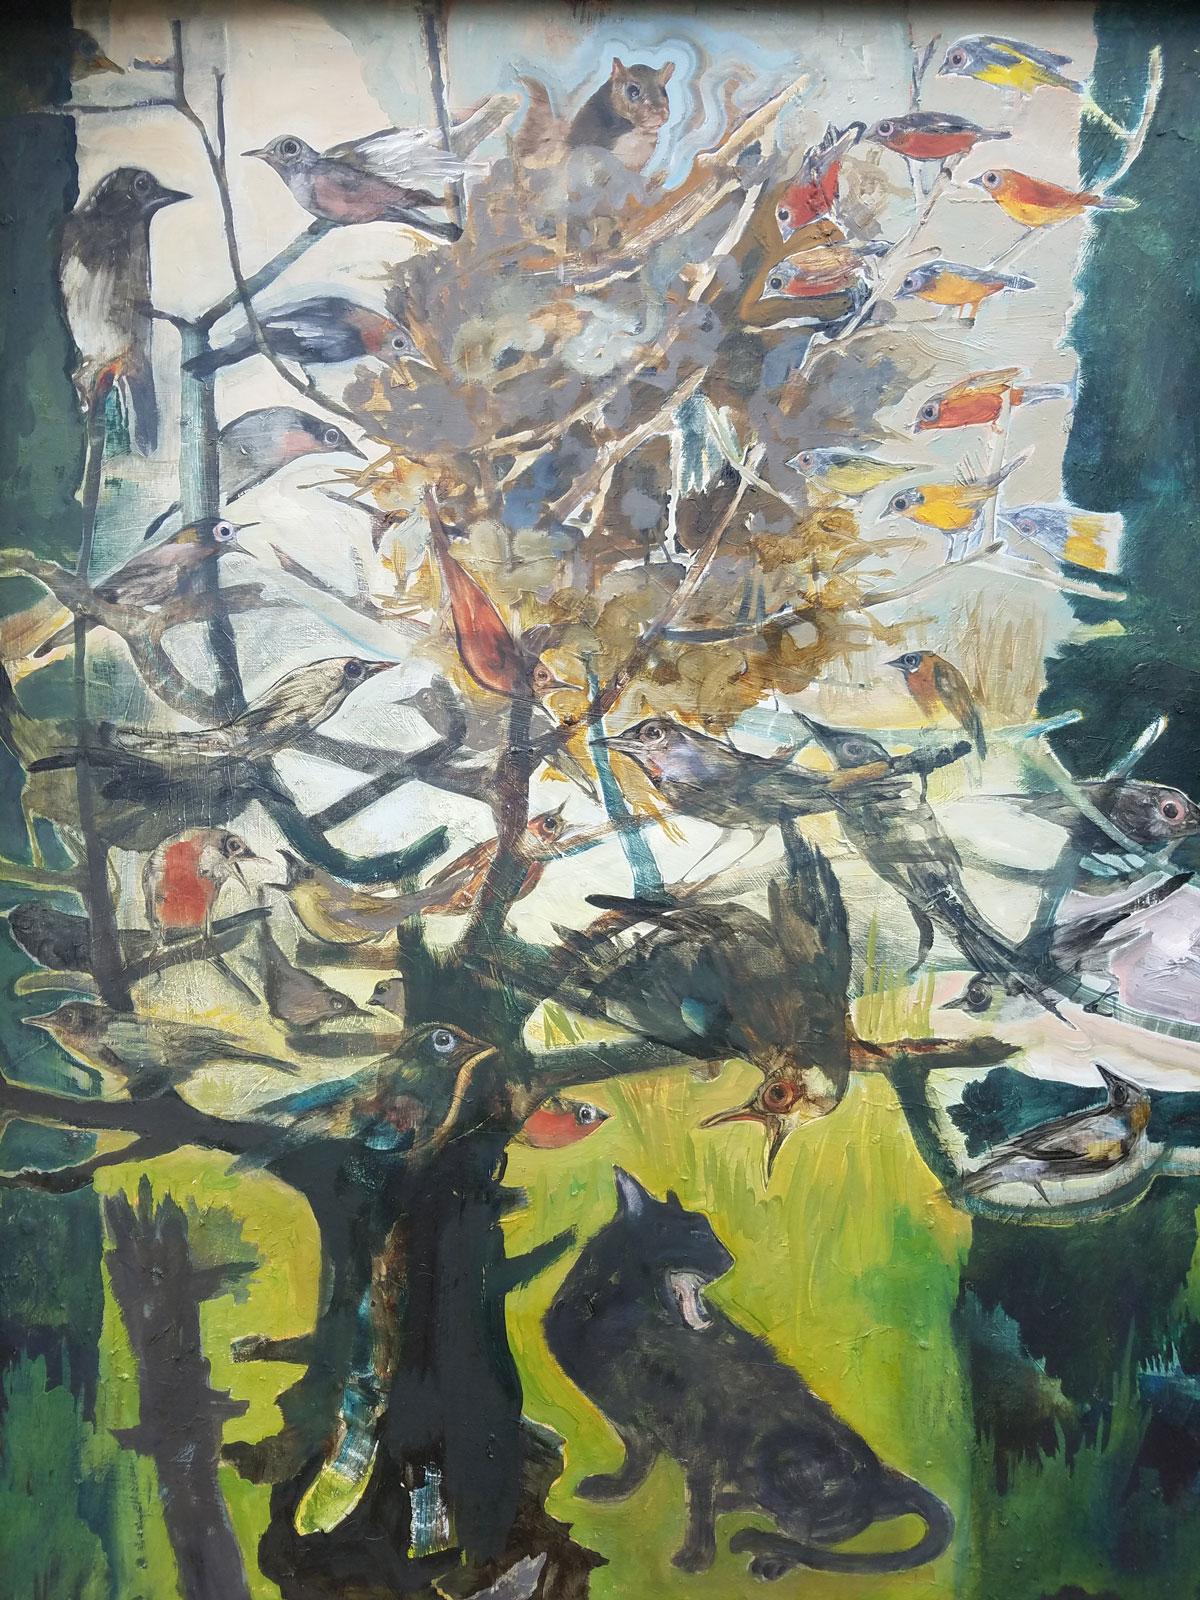 Squirrel's Nest  by Diane Kilgore Condon